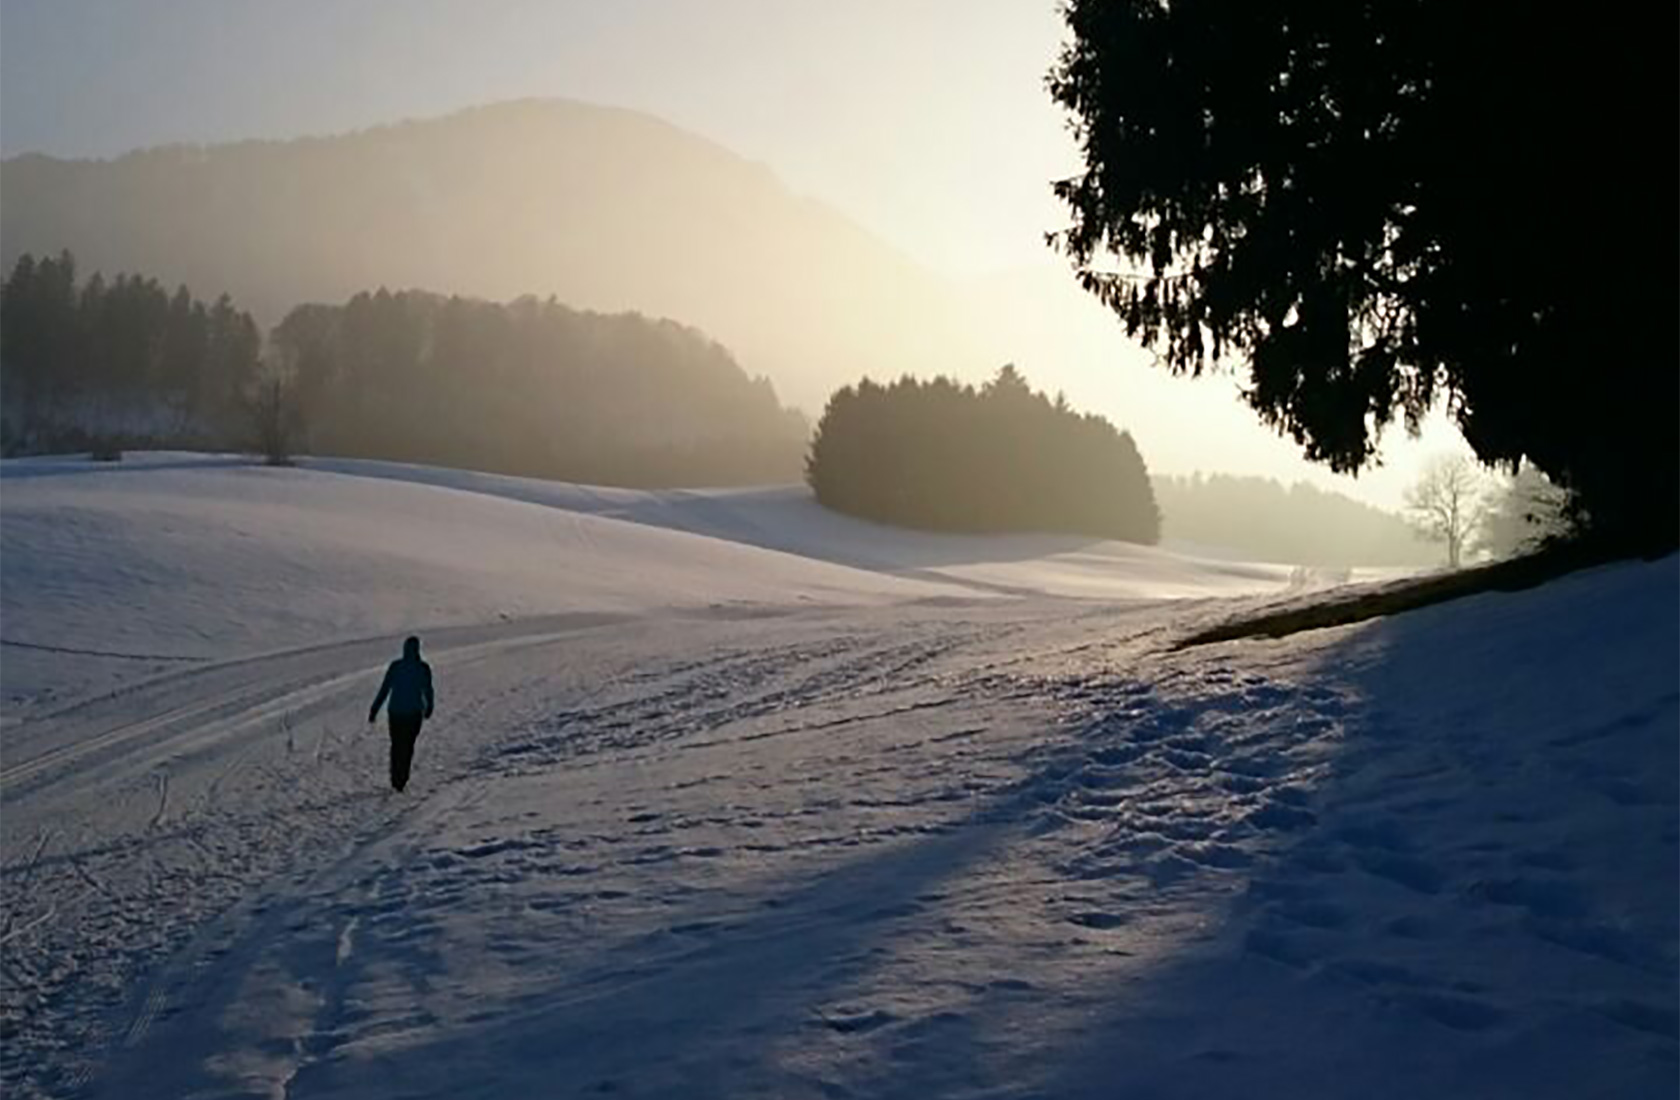 Spaziergang und Wandern im Urlaub im Tannheimer Tal in Tirol